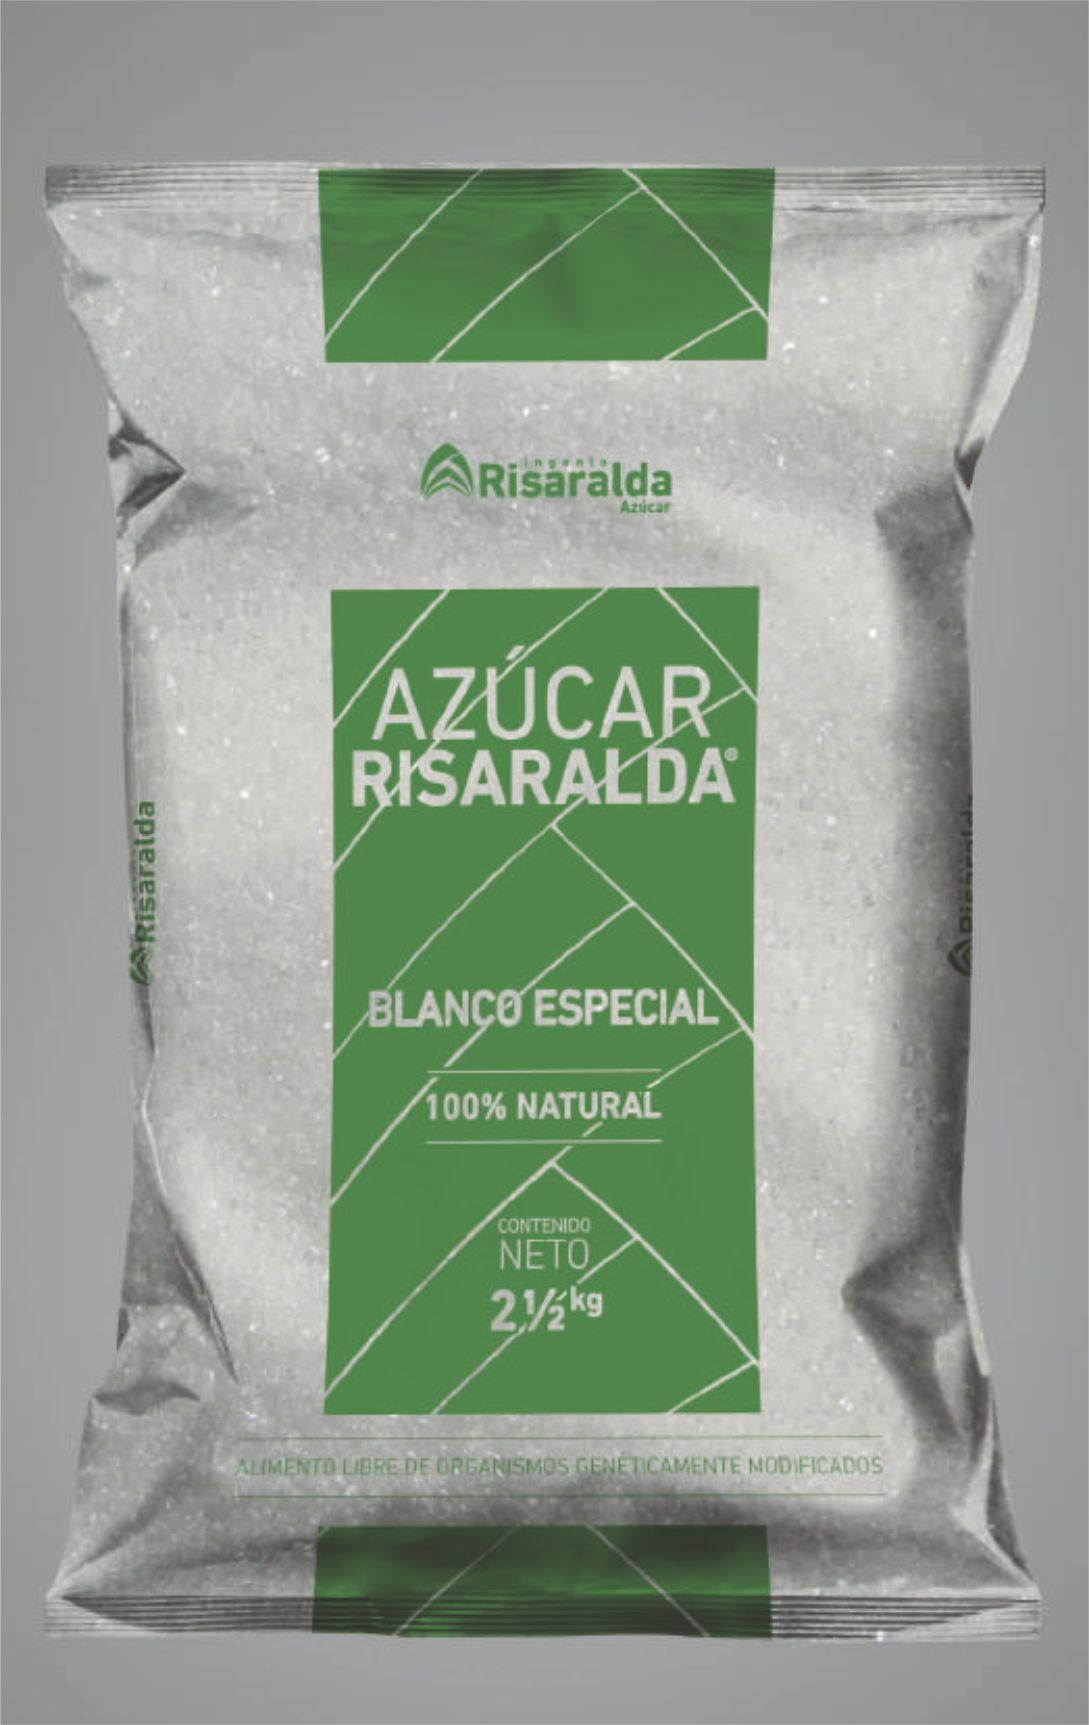 AZÚCAR BLANCO ESPECIAL 2½ Kg